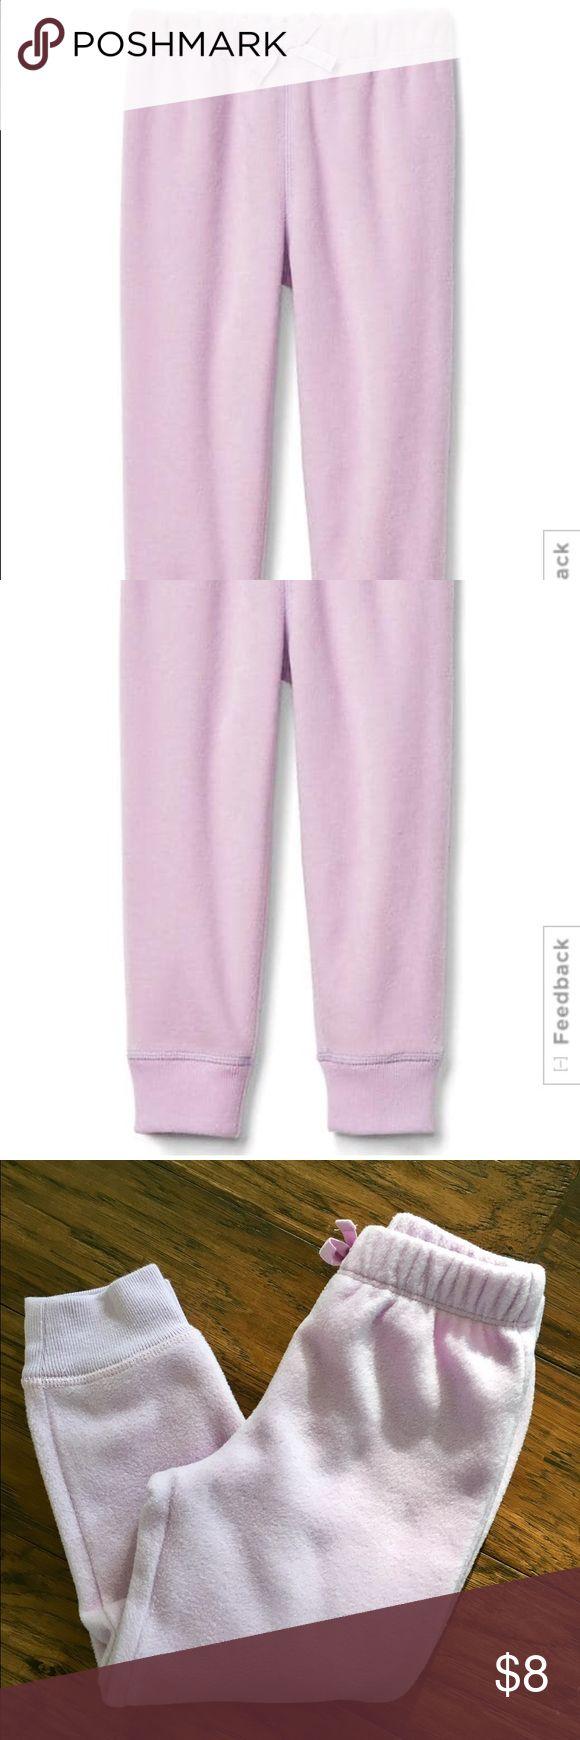 Gap pro fleece joggers Cozy cute lilac colored pro fleece joggers. Washed but never worn, EUC, smoke free home. GAP Bottoms Sweatpants & Joggers